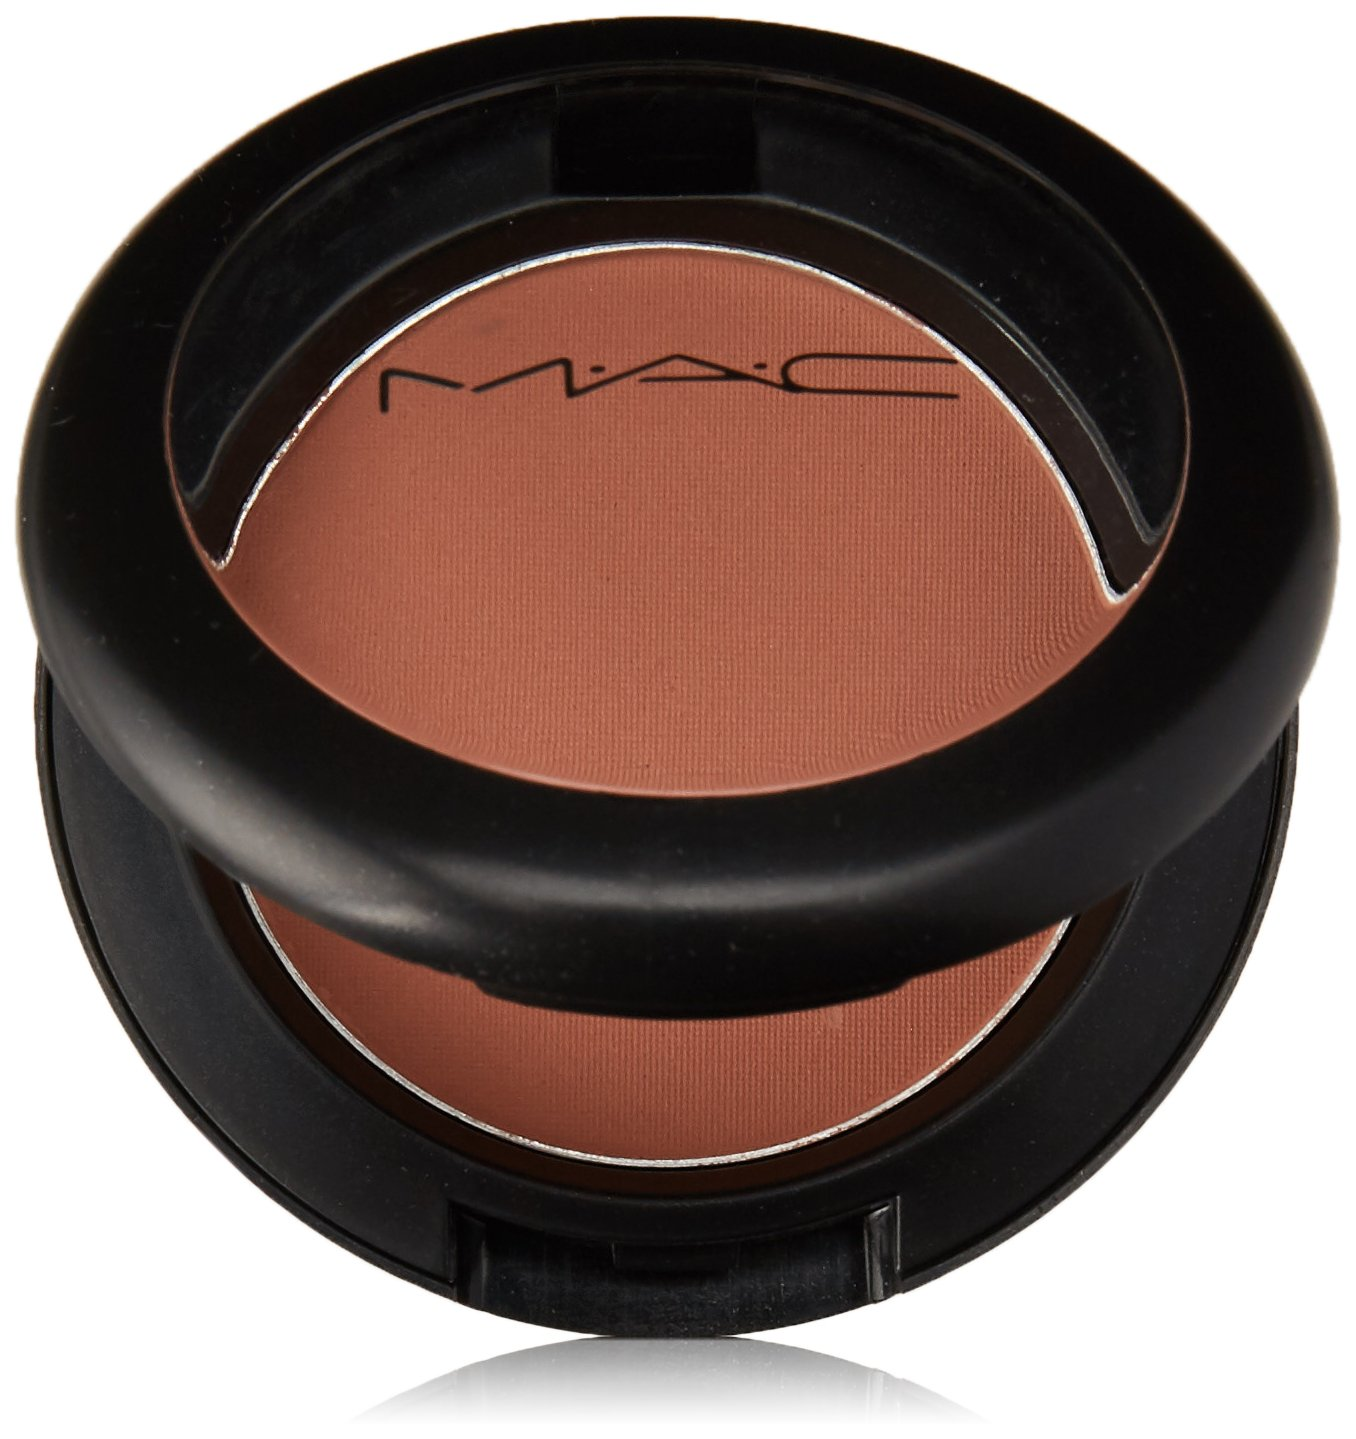 Mac Cosmetic Sheertone Blush Blushbaby